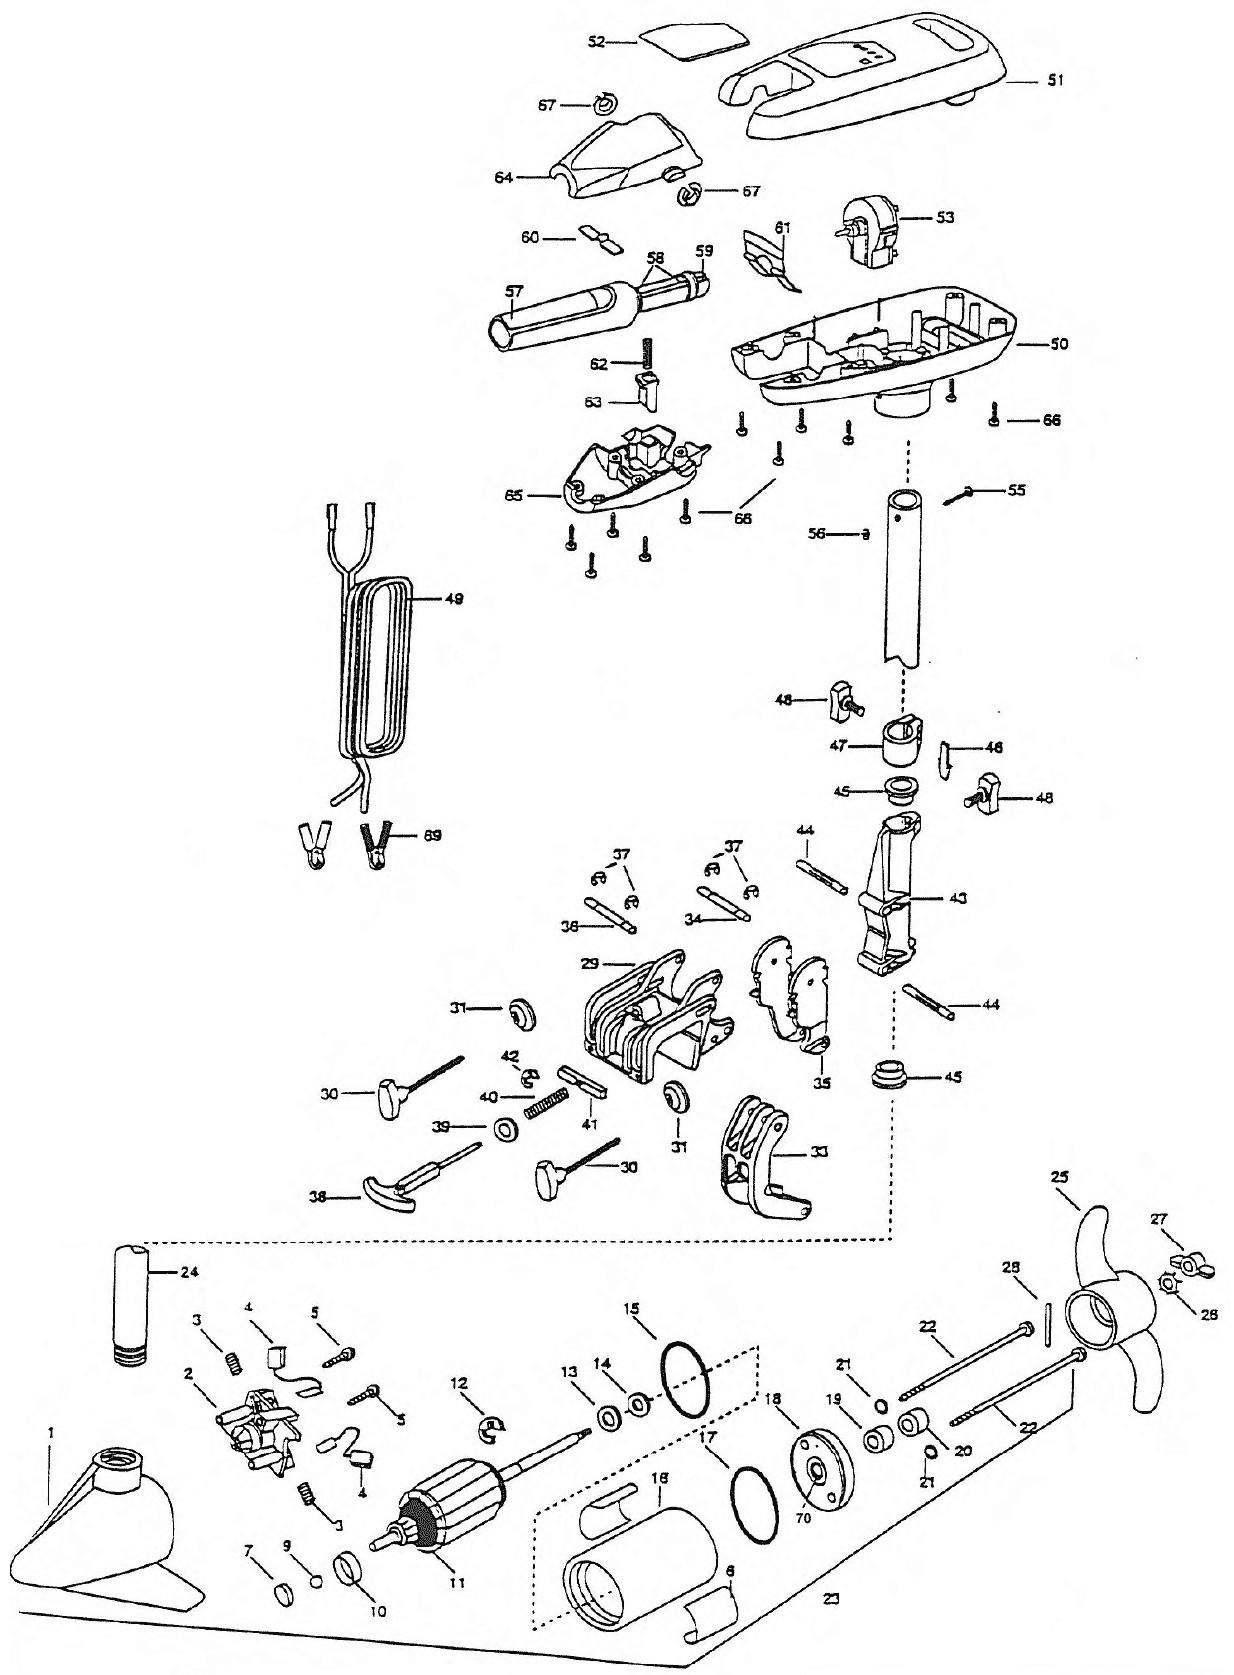 minn kota battery charger wiring diagram five way switch stunning 36 volt